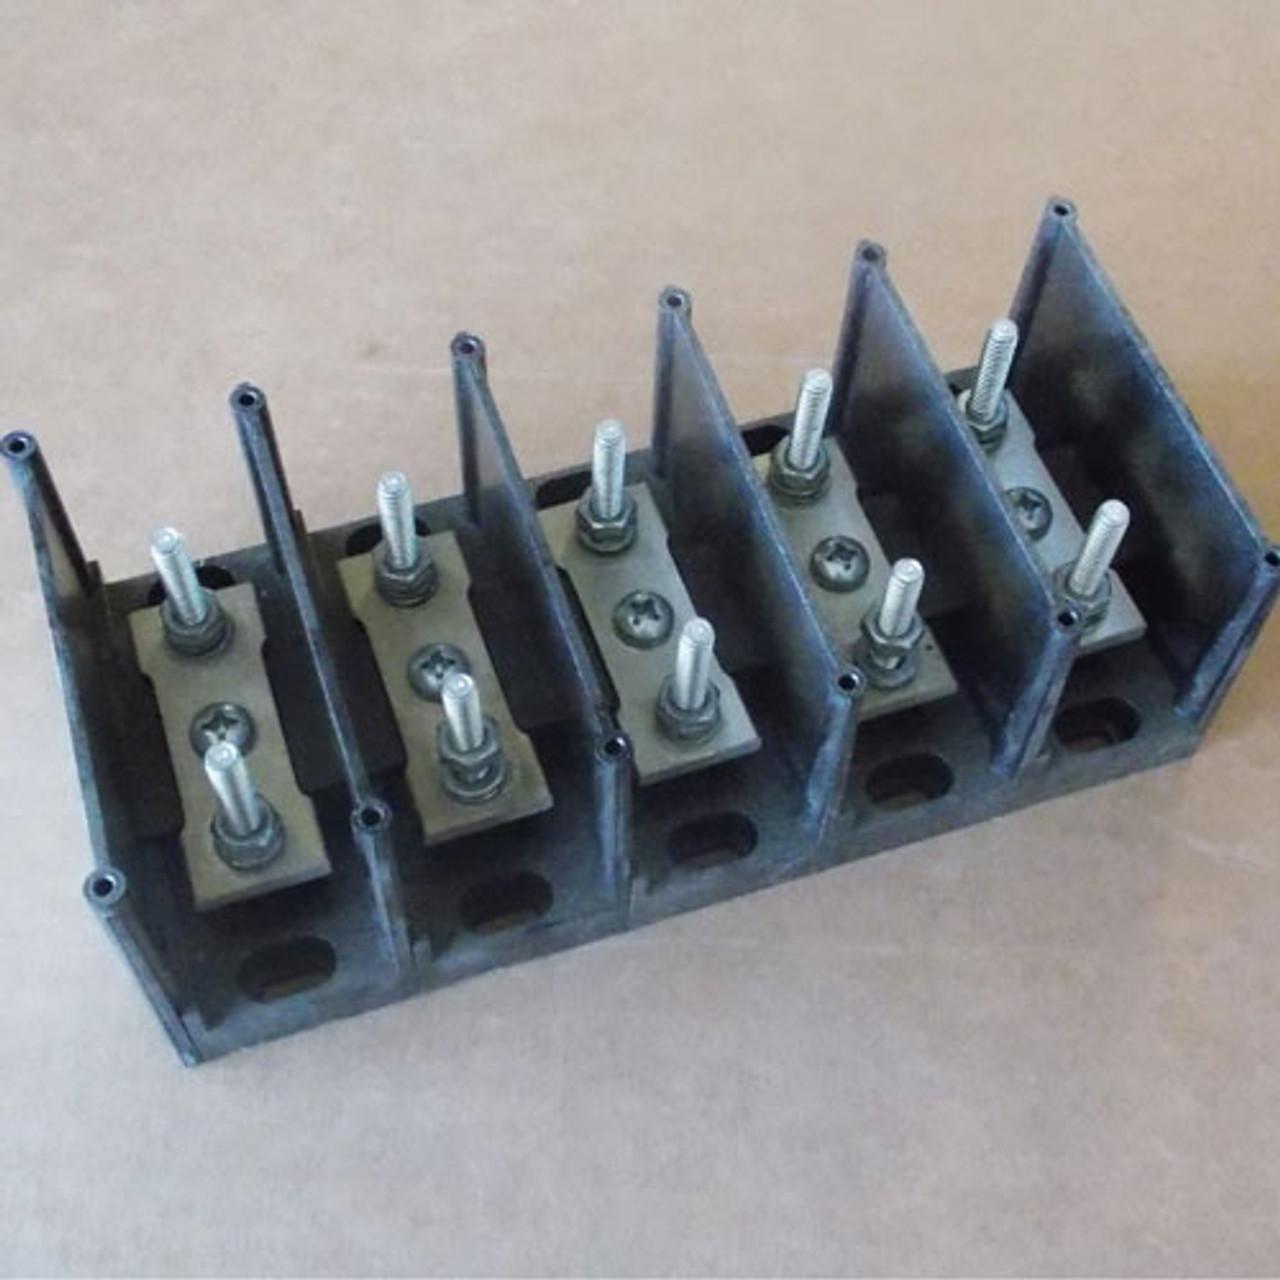 Gould Shawmut 66272 Power Distribution Block 2 Pole 600V - Used